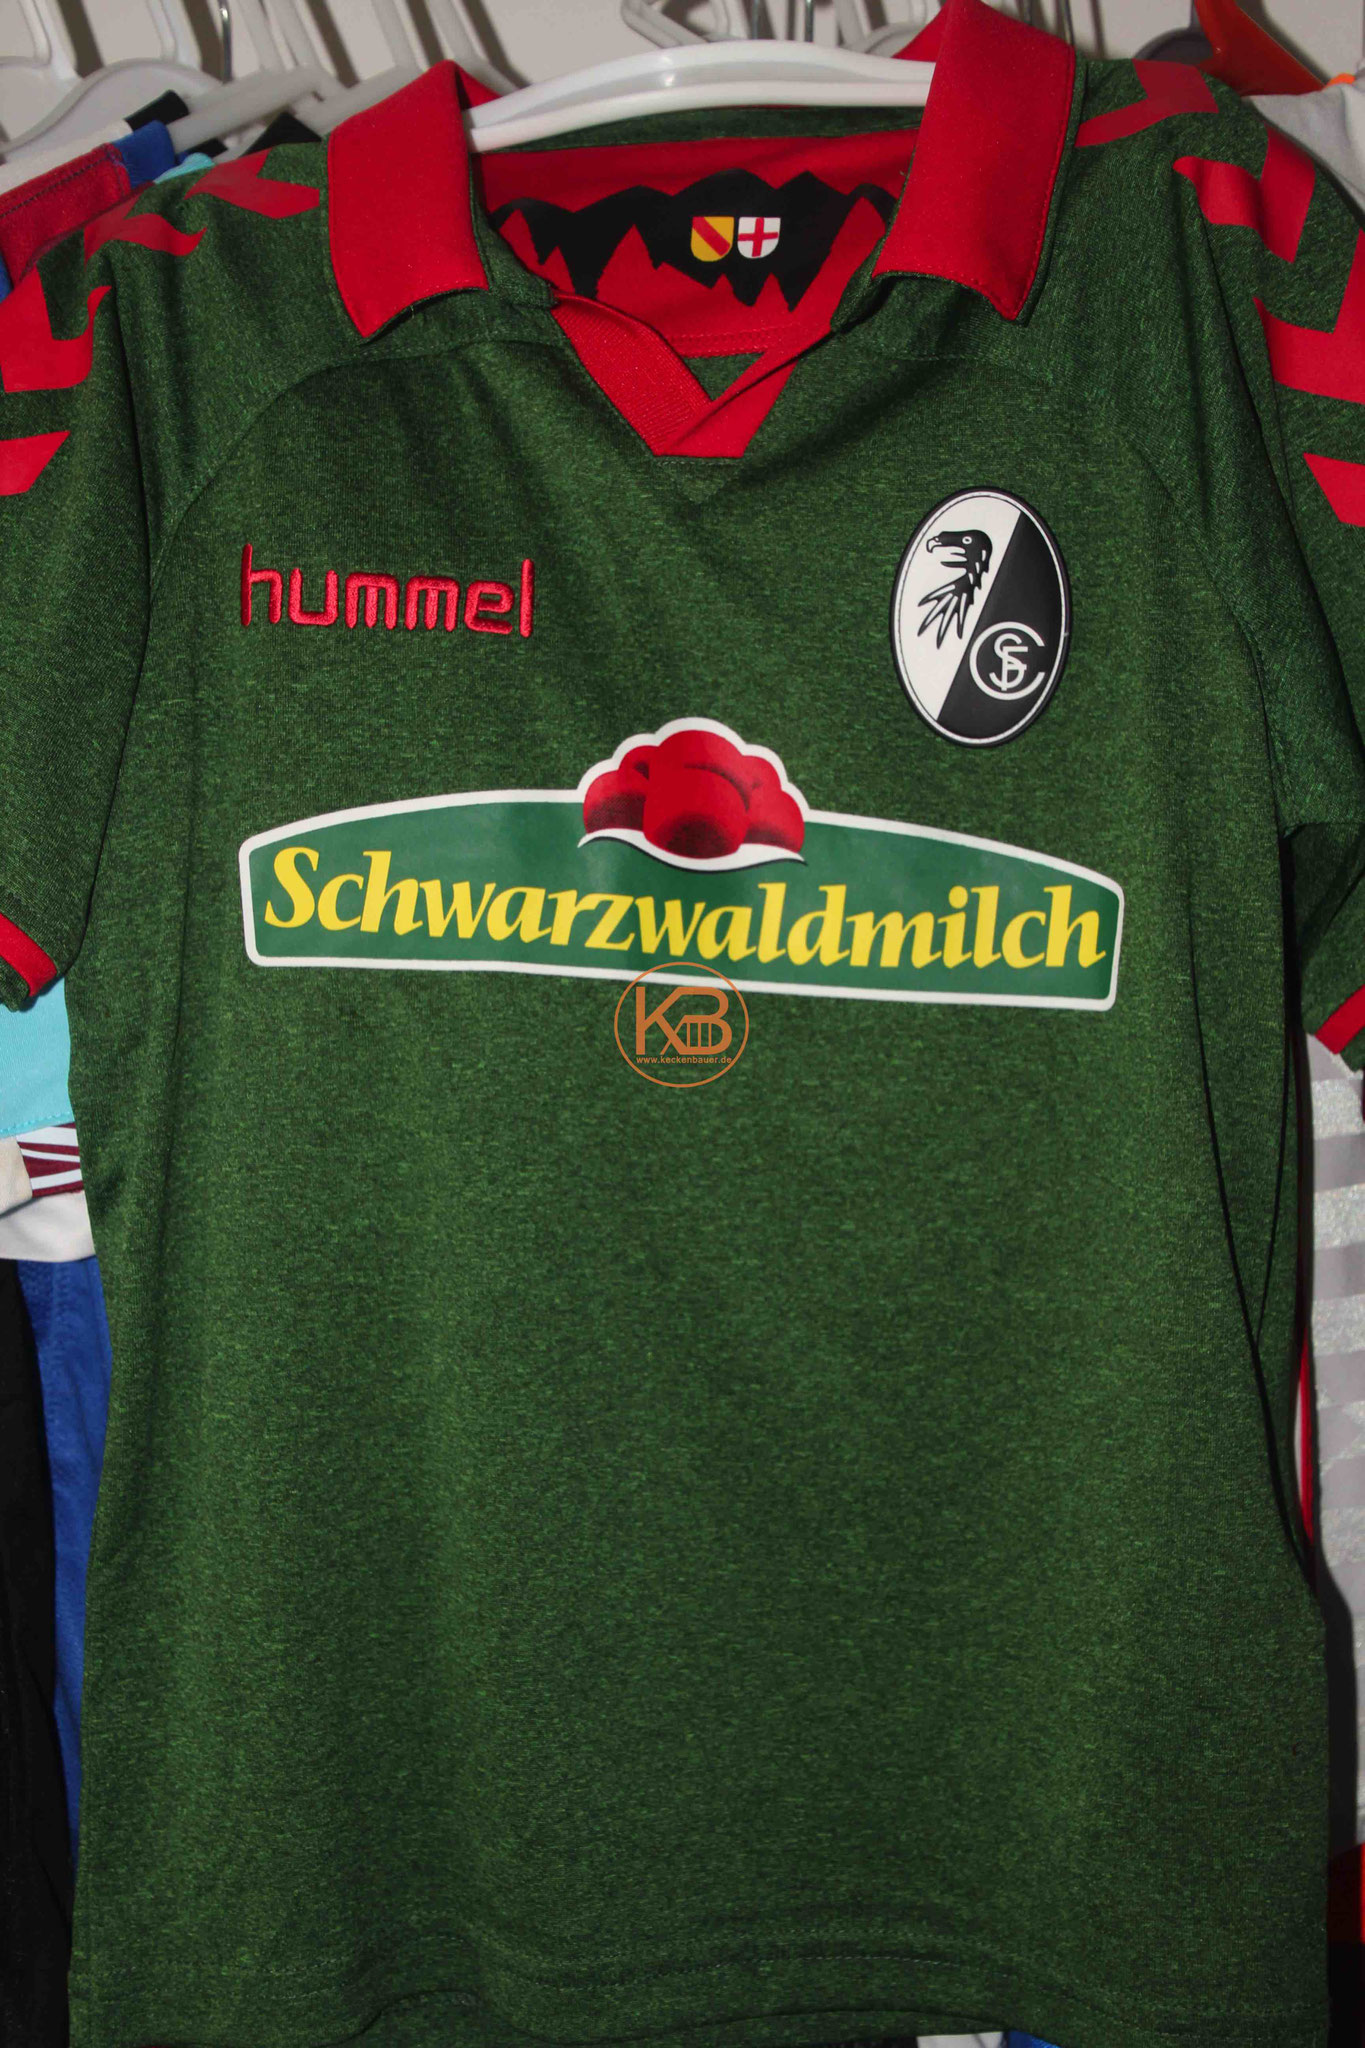 Hummel Trikot vom SC Freiburg